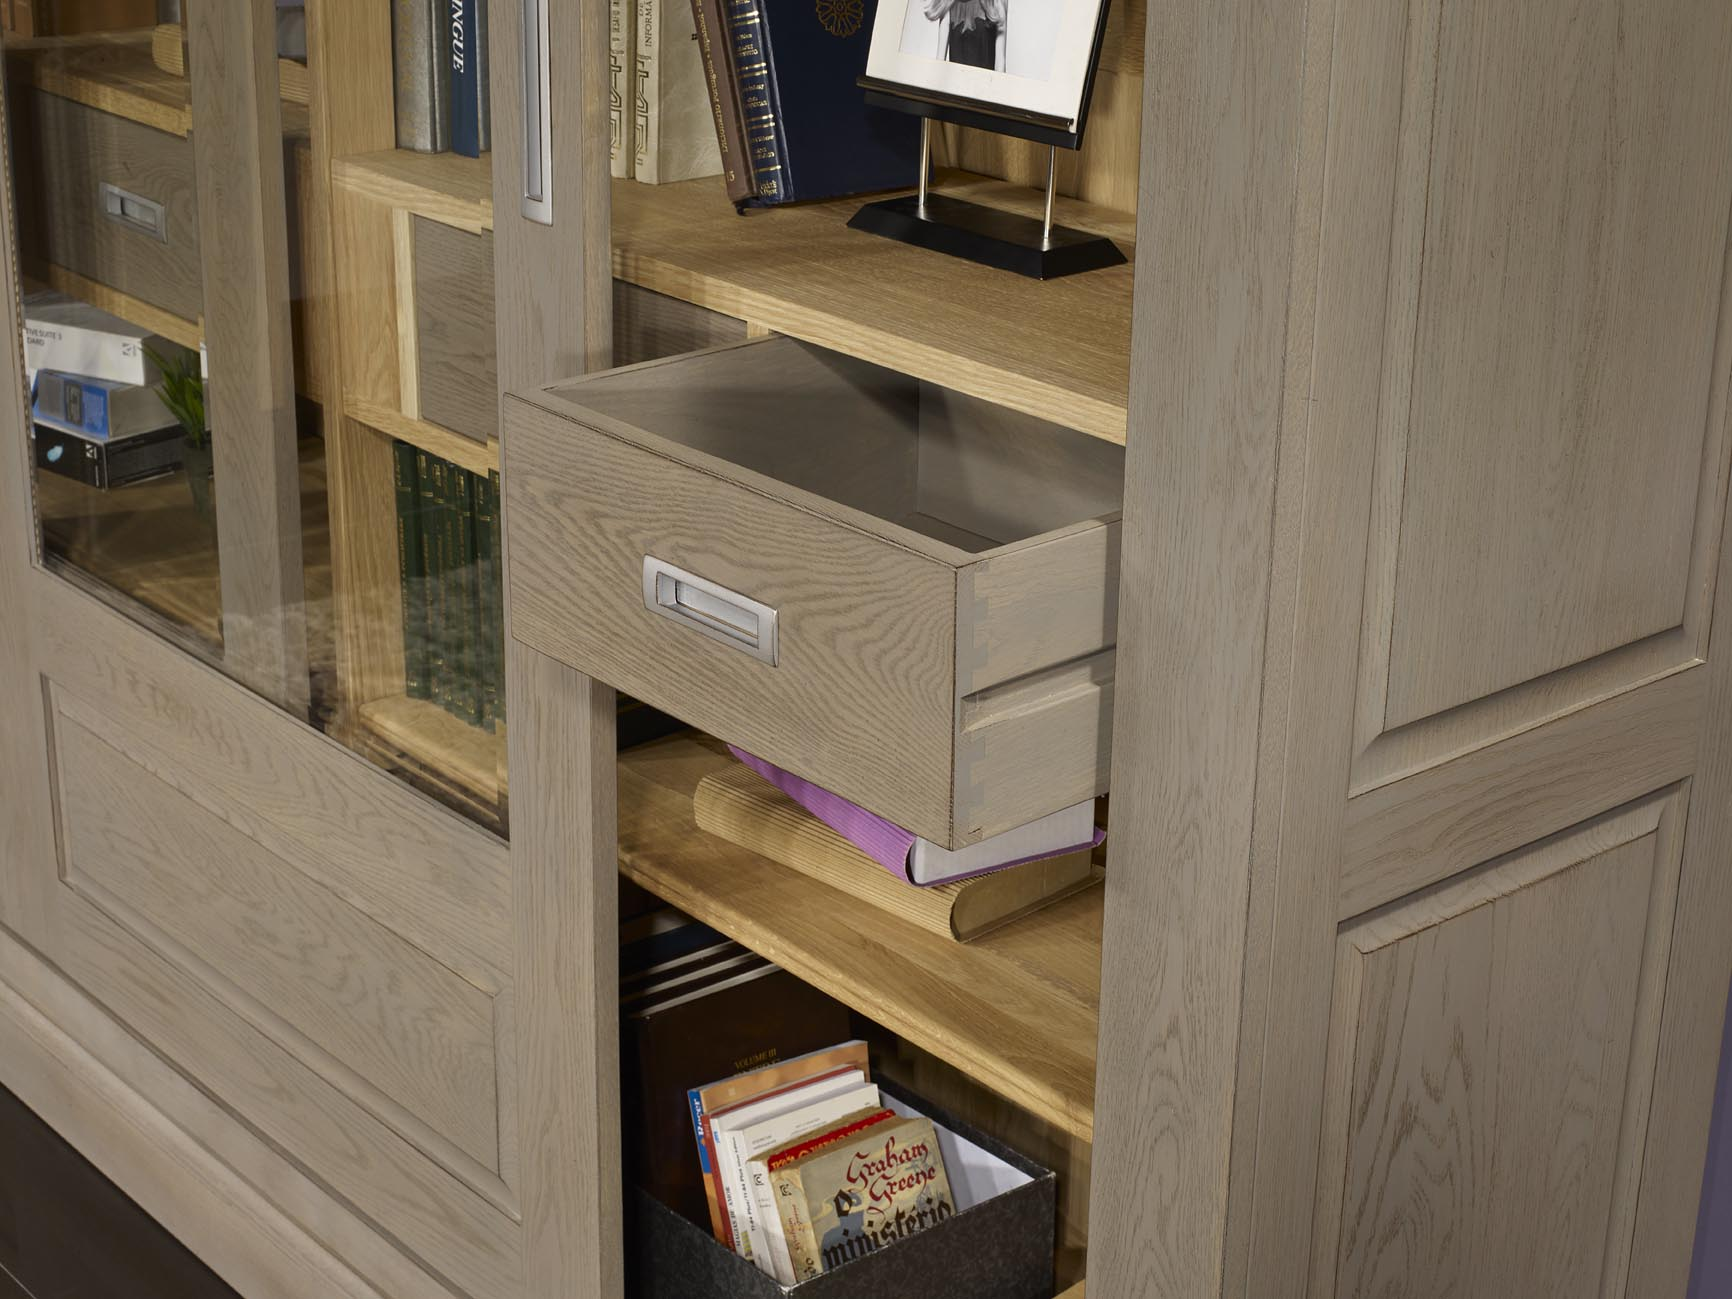 Meuble Tv Bibliotheque Porte Coulissante Artzein Com # Exemple De Bureau Bibliotheque En Chene Massif